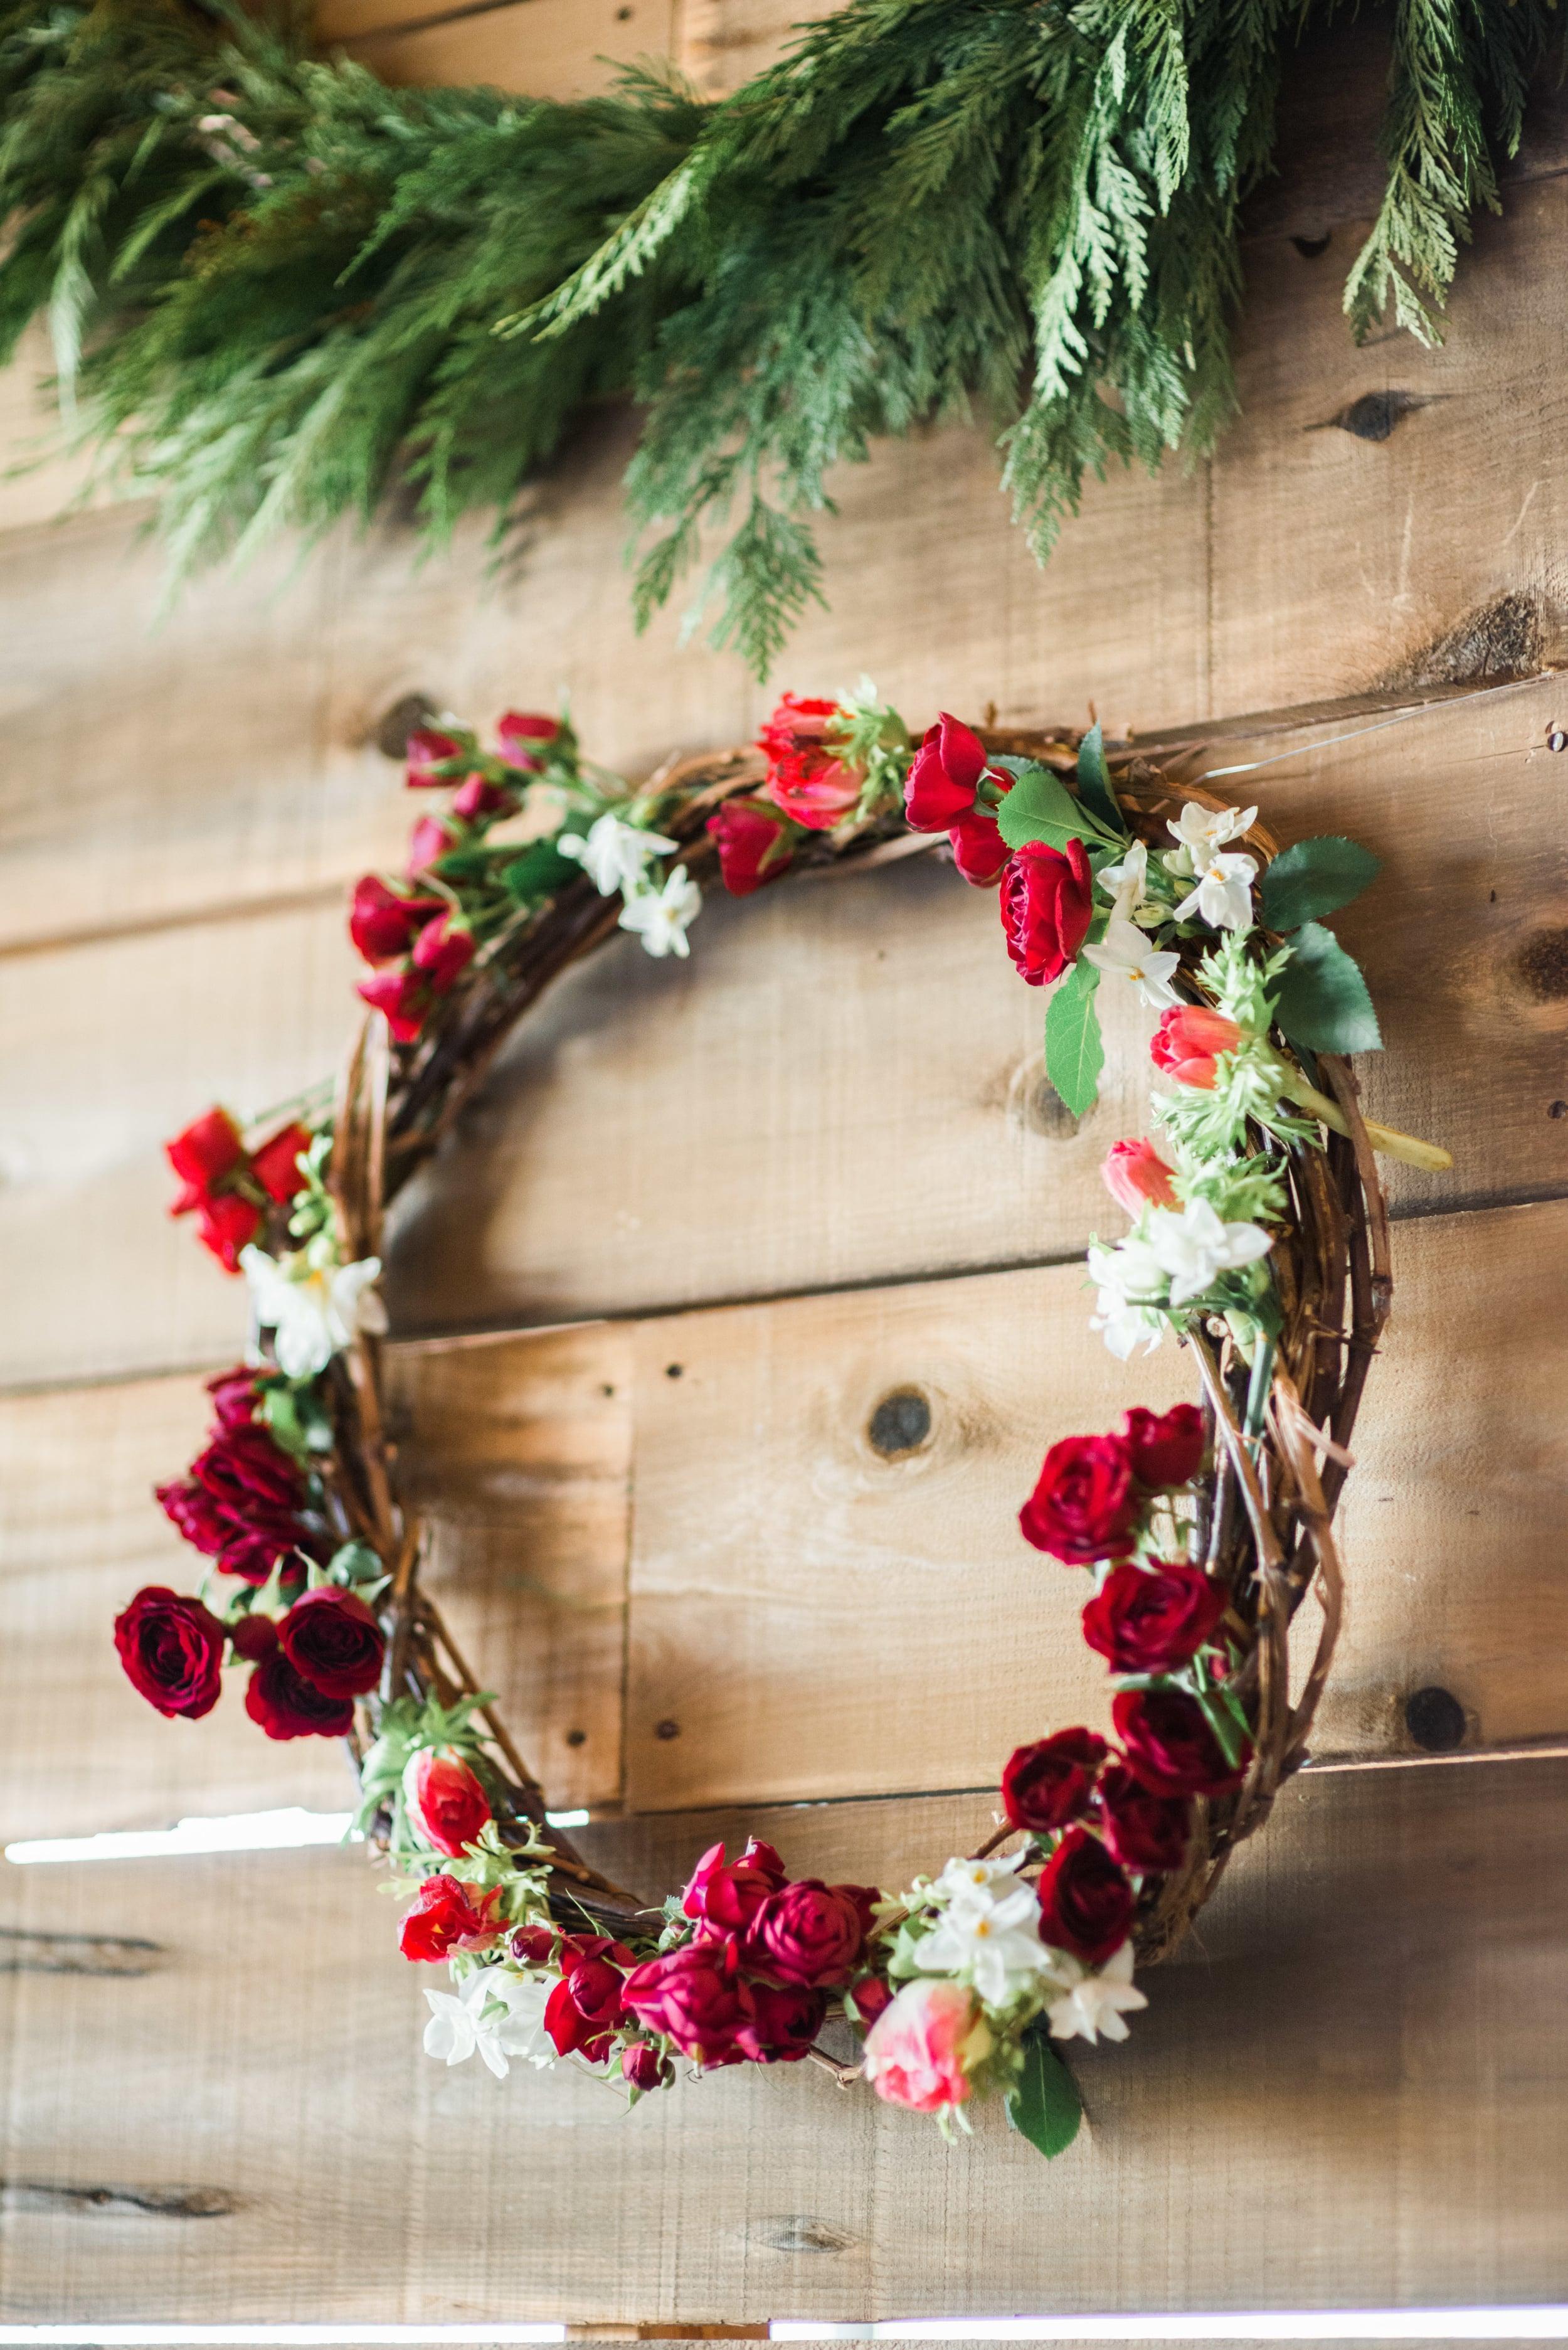 Natalie_Schutt_Photography_Winter_Wedding_San_Luis_Obispo-65.jpg